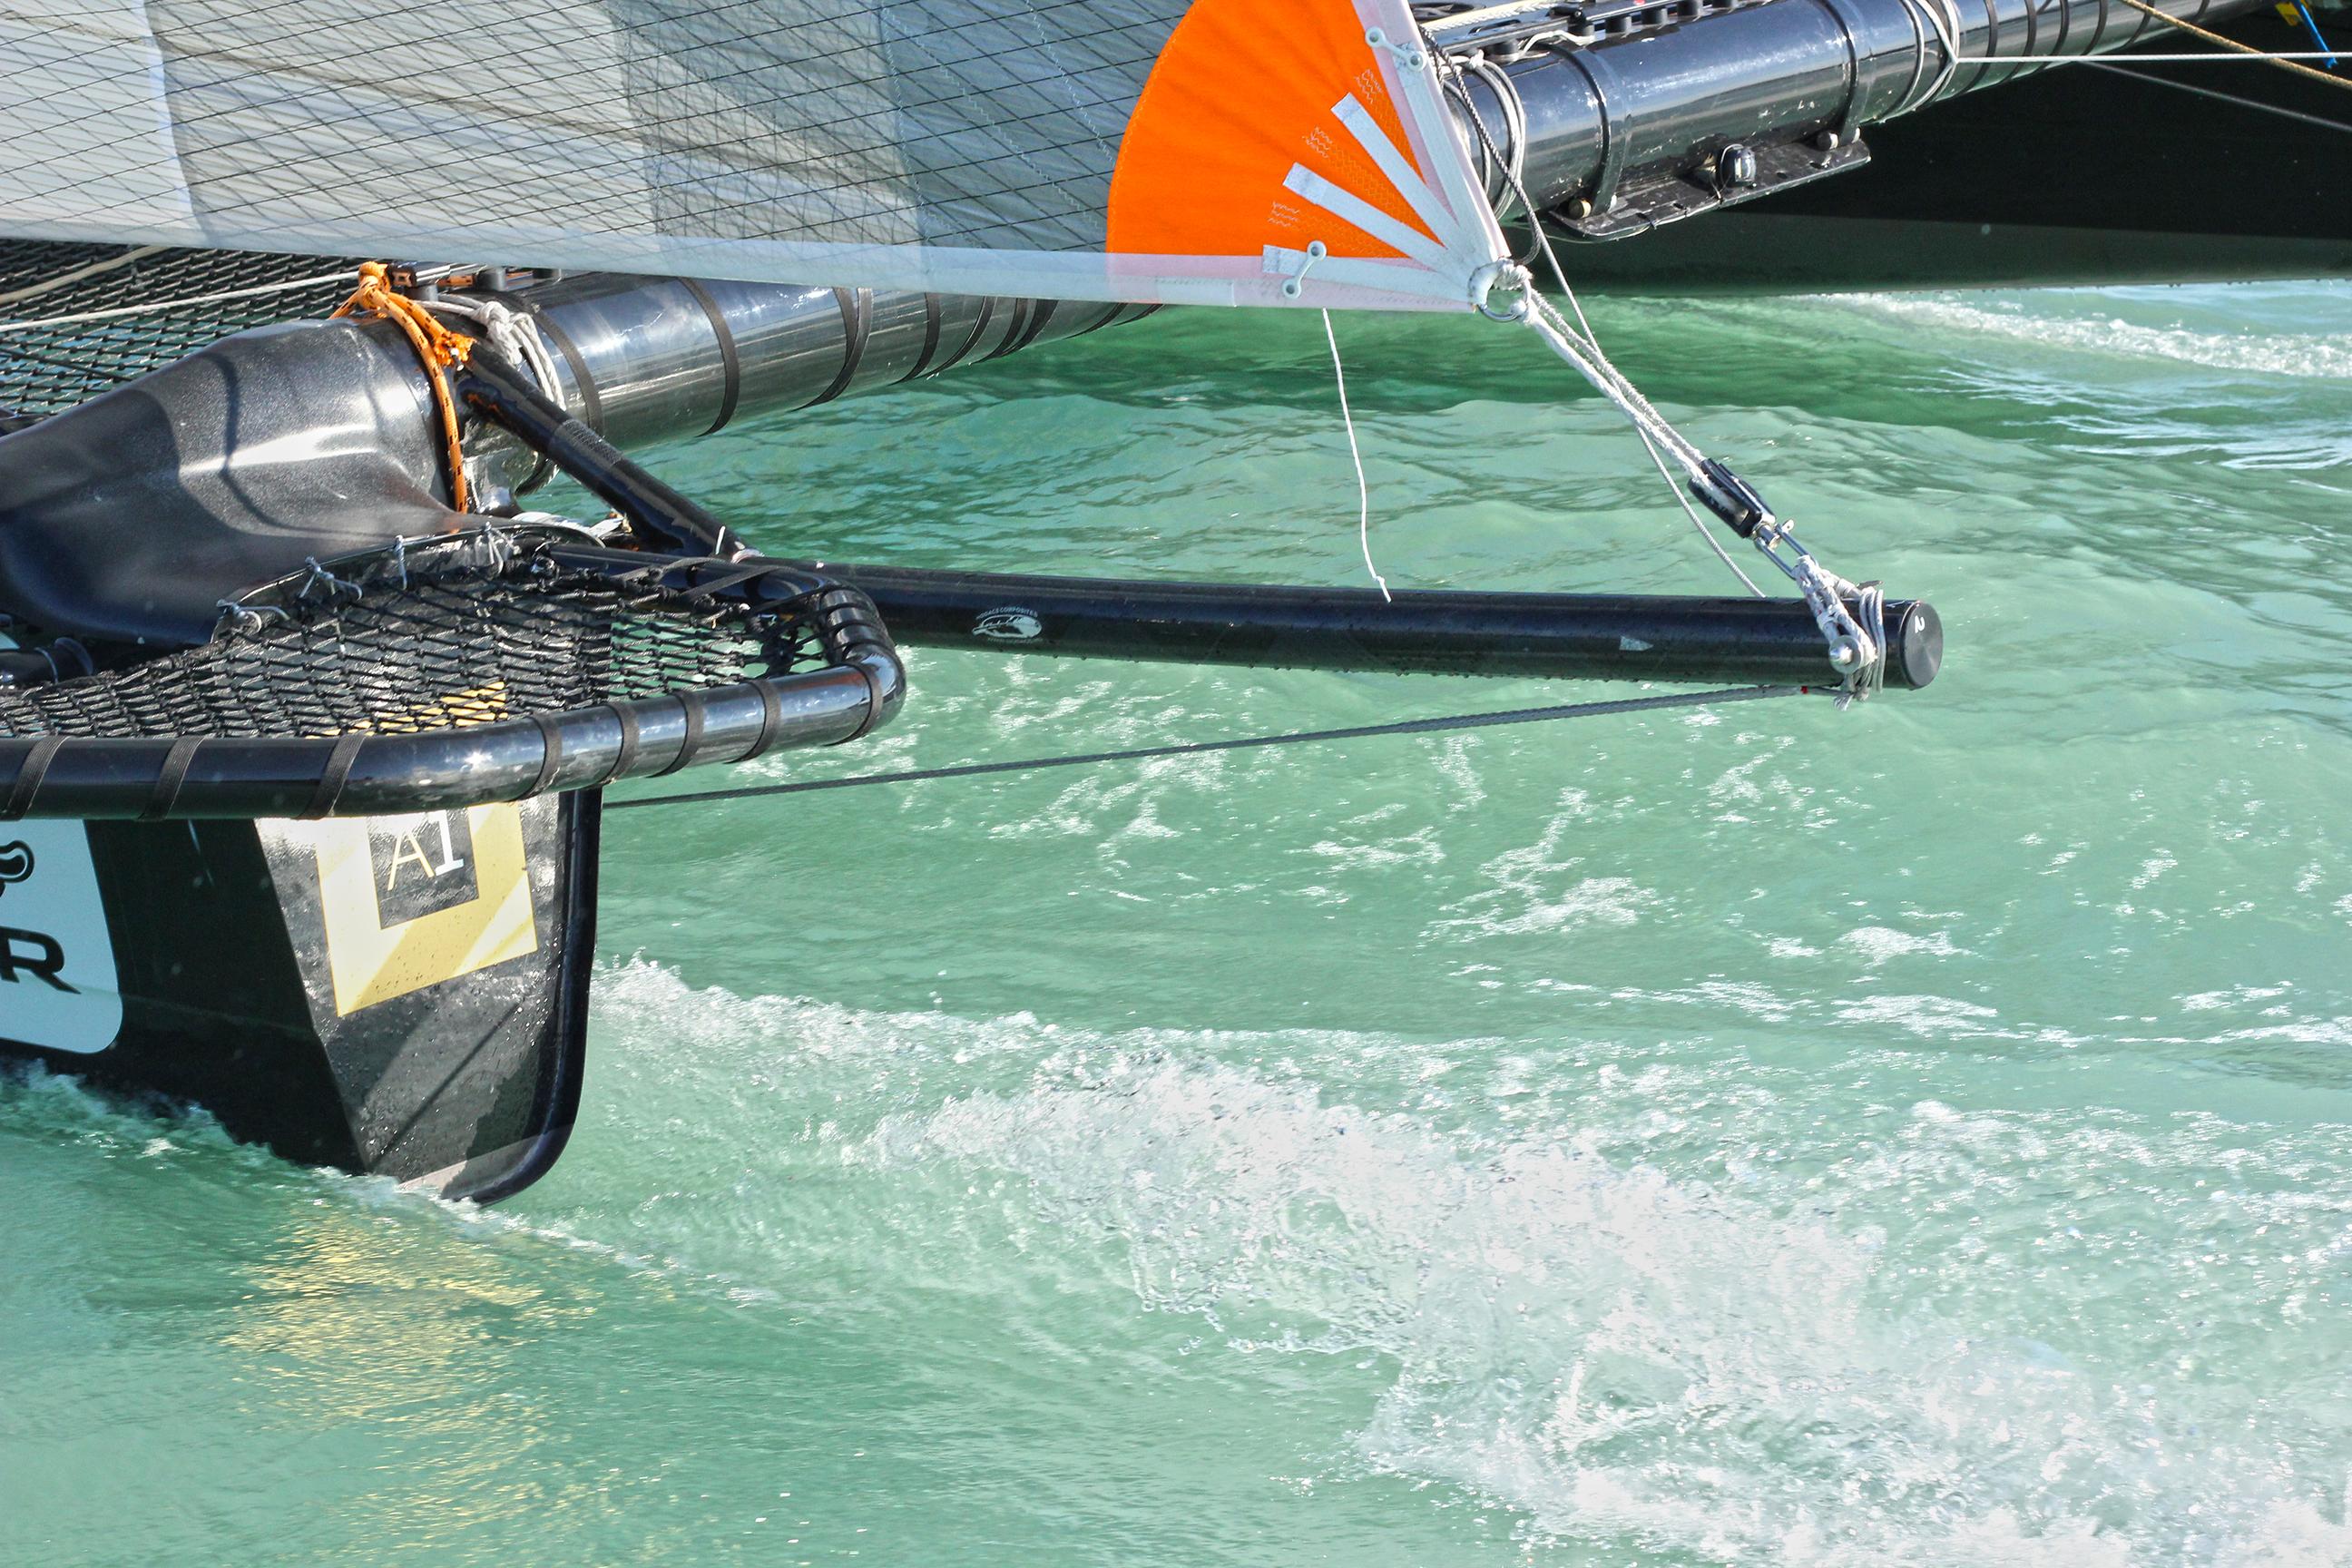 Litkey Farkas Farsudar Decision 35 Catamaran Kekszalag Vitorlazas Sailing HAJOZASHU13